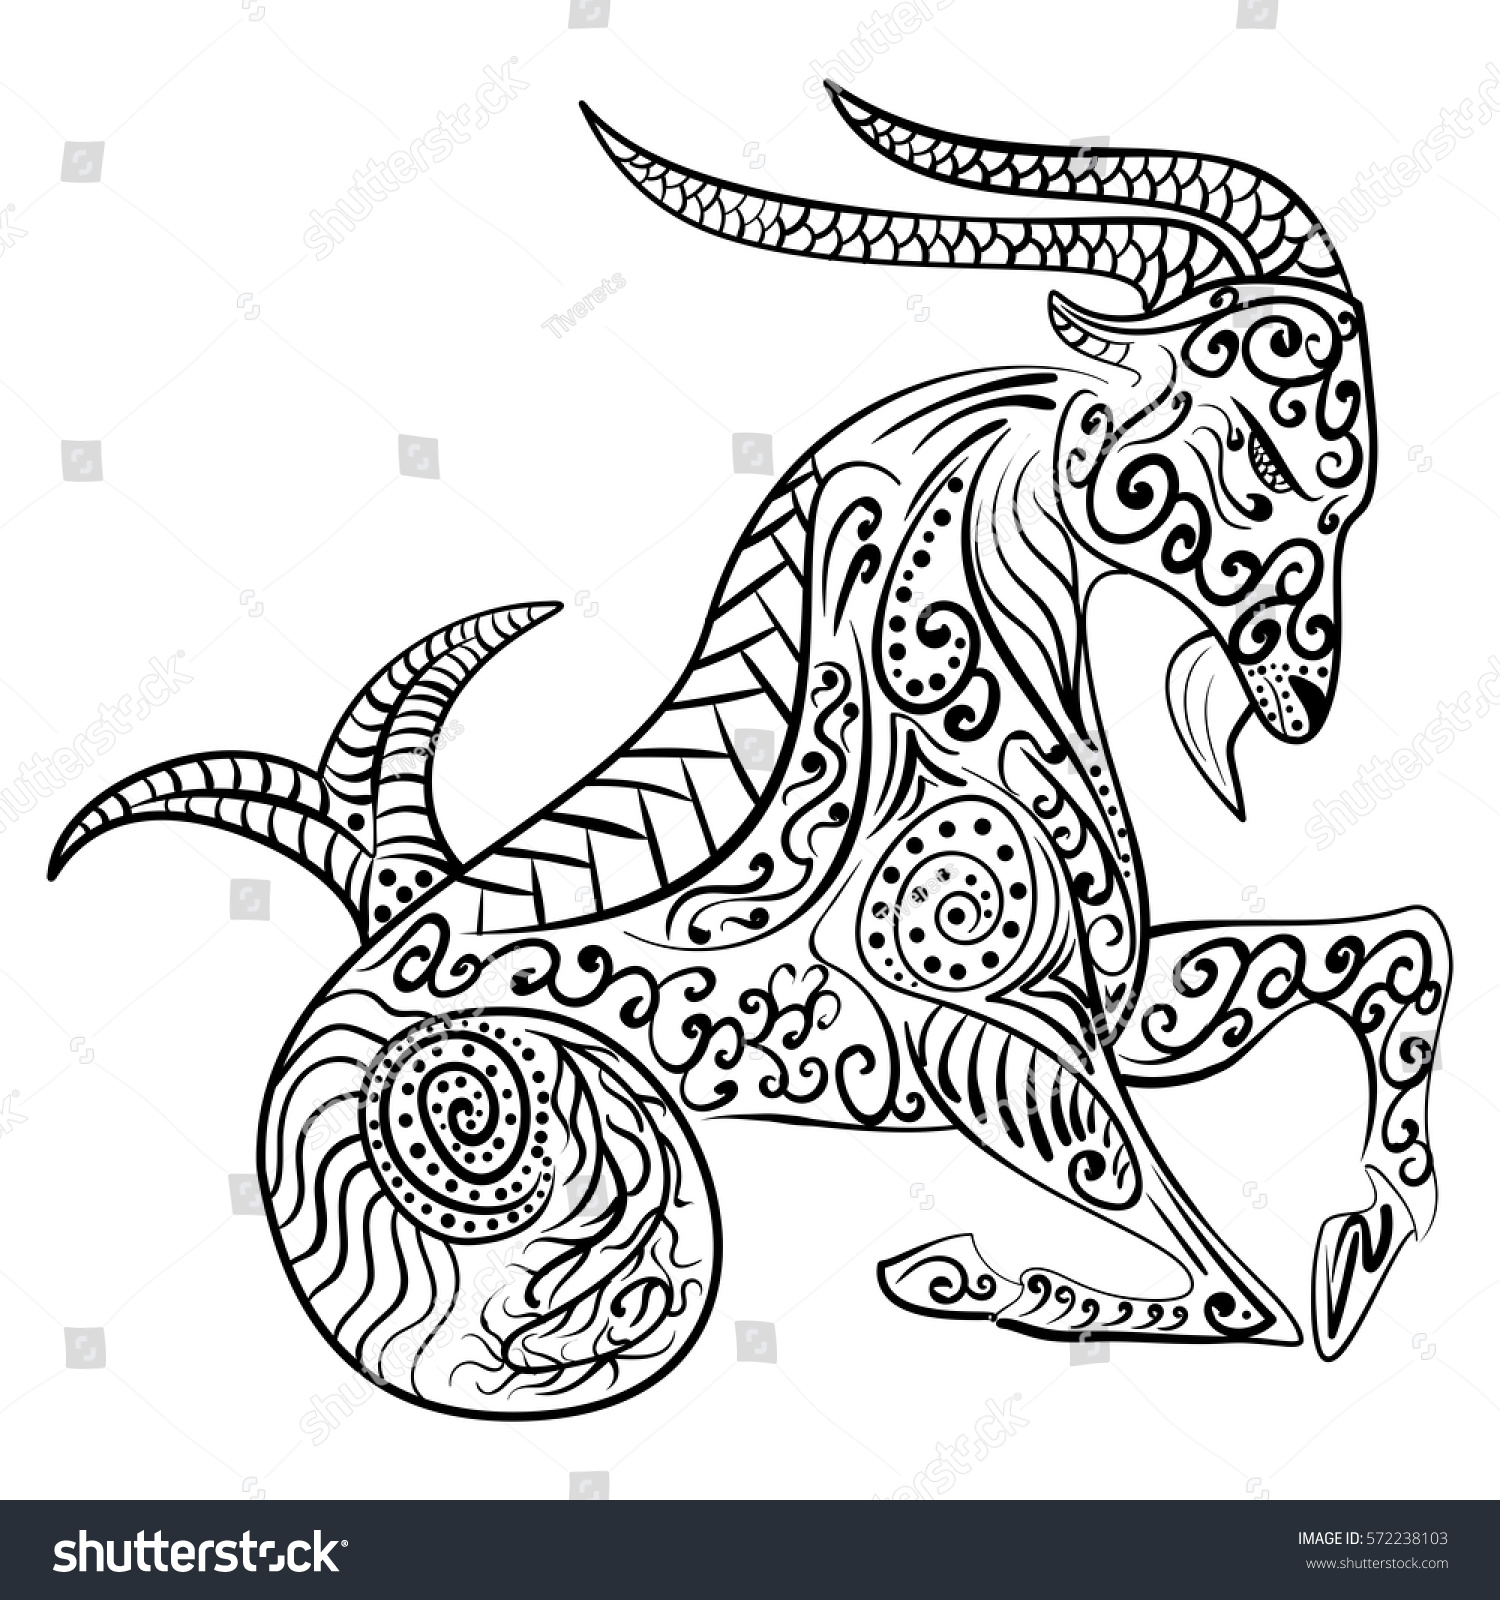 Zen tangle handdrawn zodiac capricorn ethnic stock vector for Capricorn coloring pages